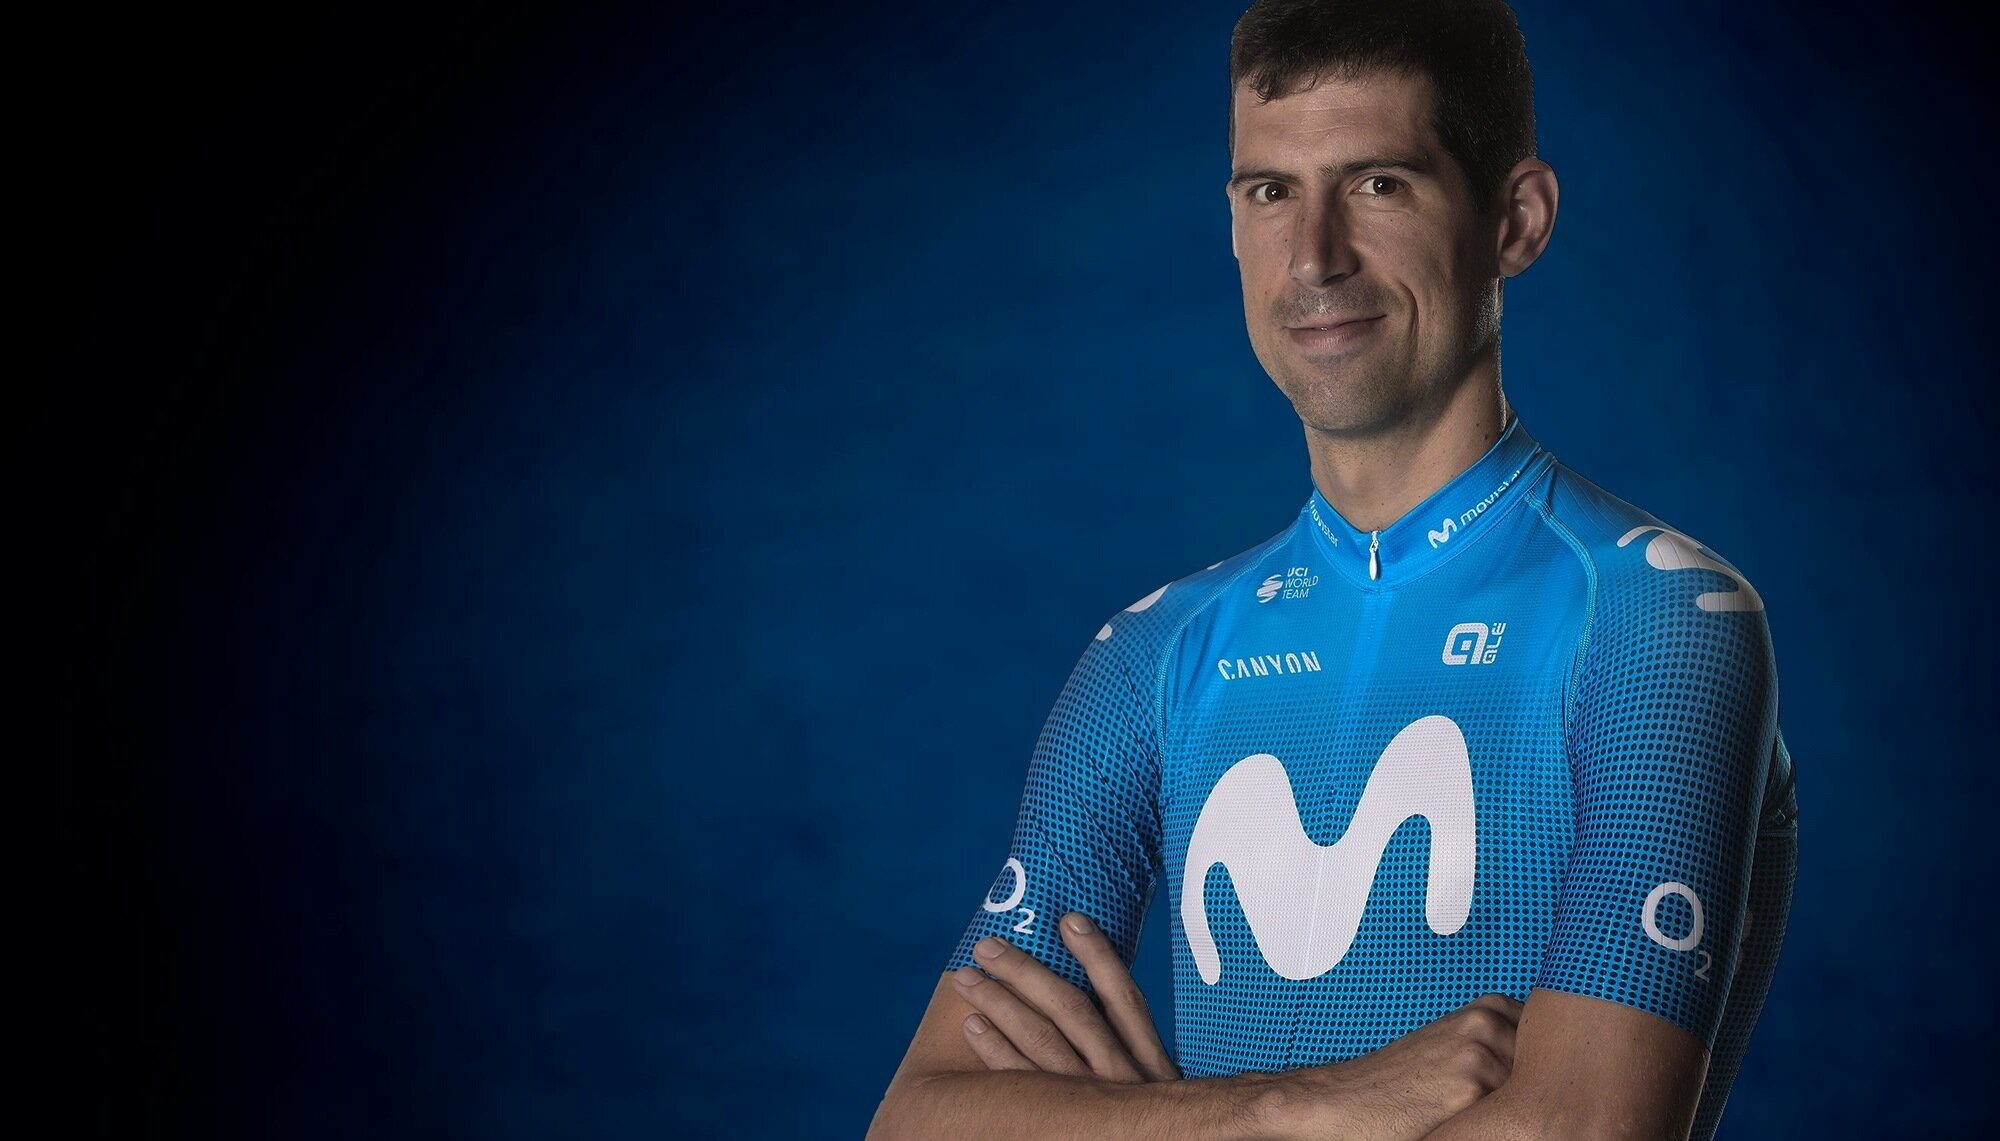 Imanol Erviti, cyklista, tím Movistar Team